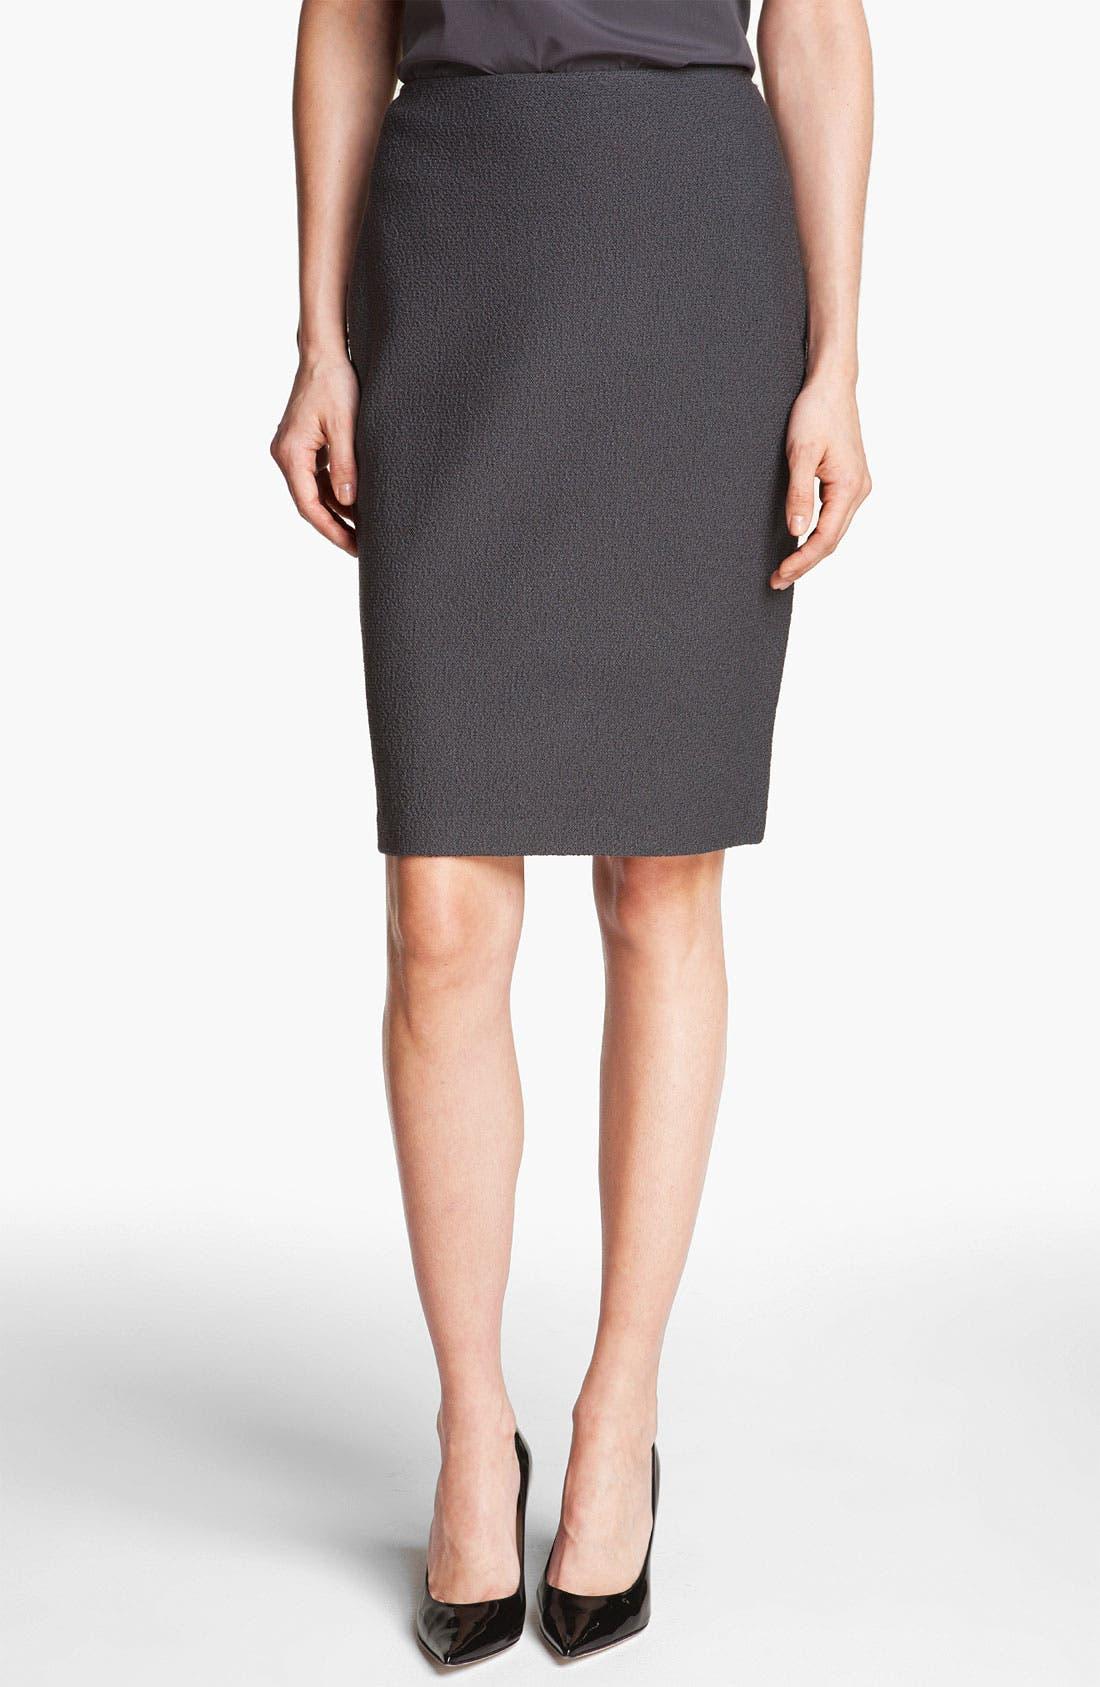 Alternate Image 1 Selected - St. John Collection Bouclé Knit Pencil Skirt